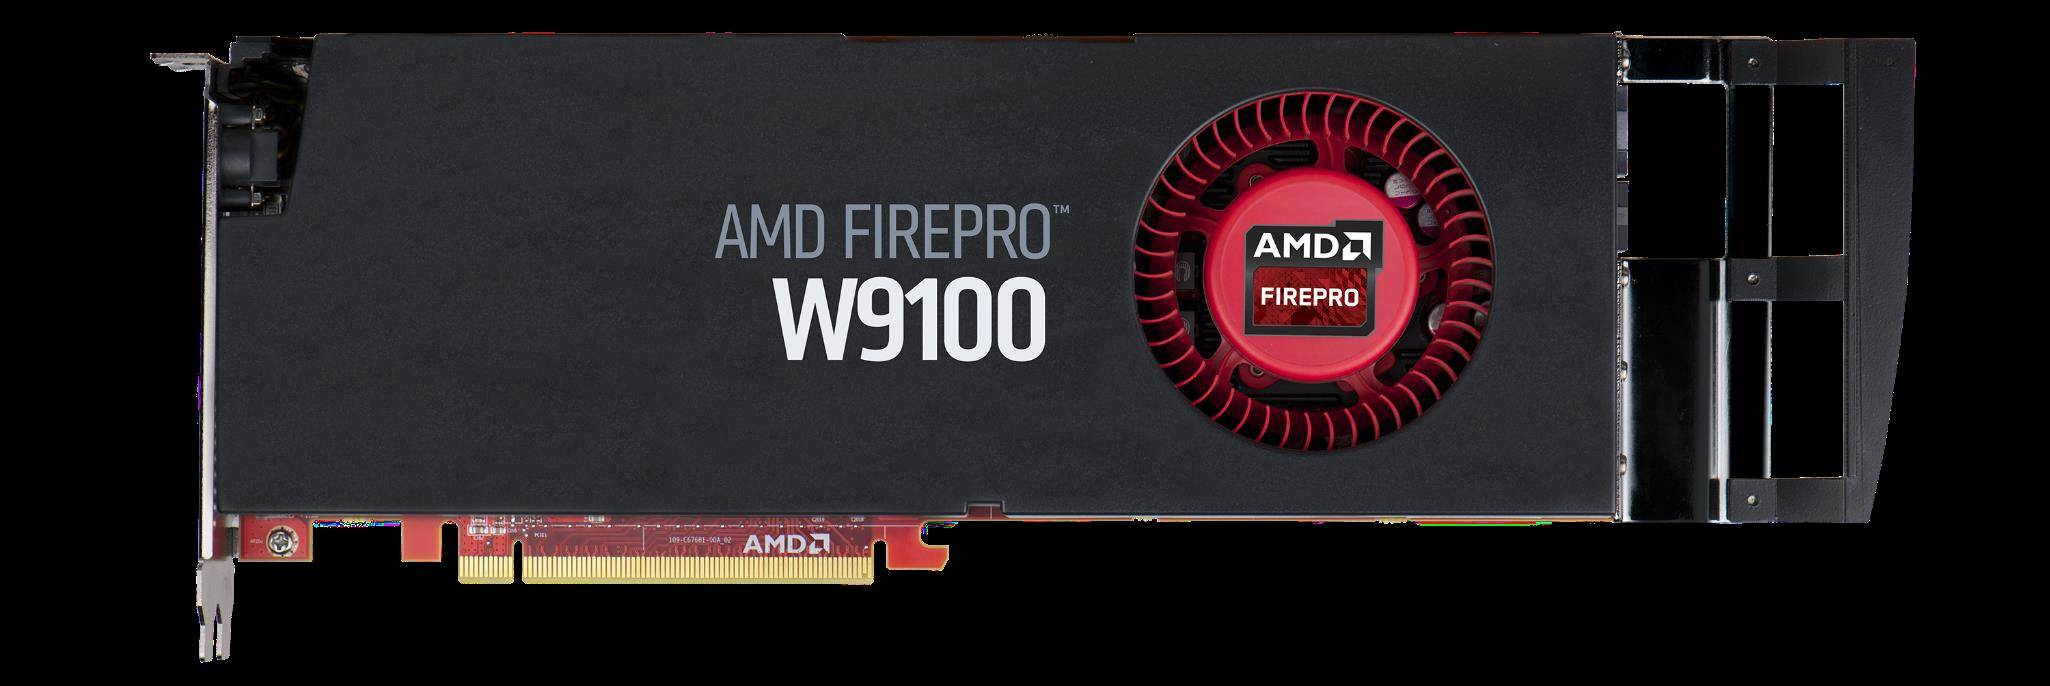 AMD W9100